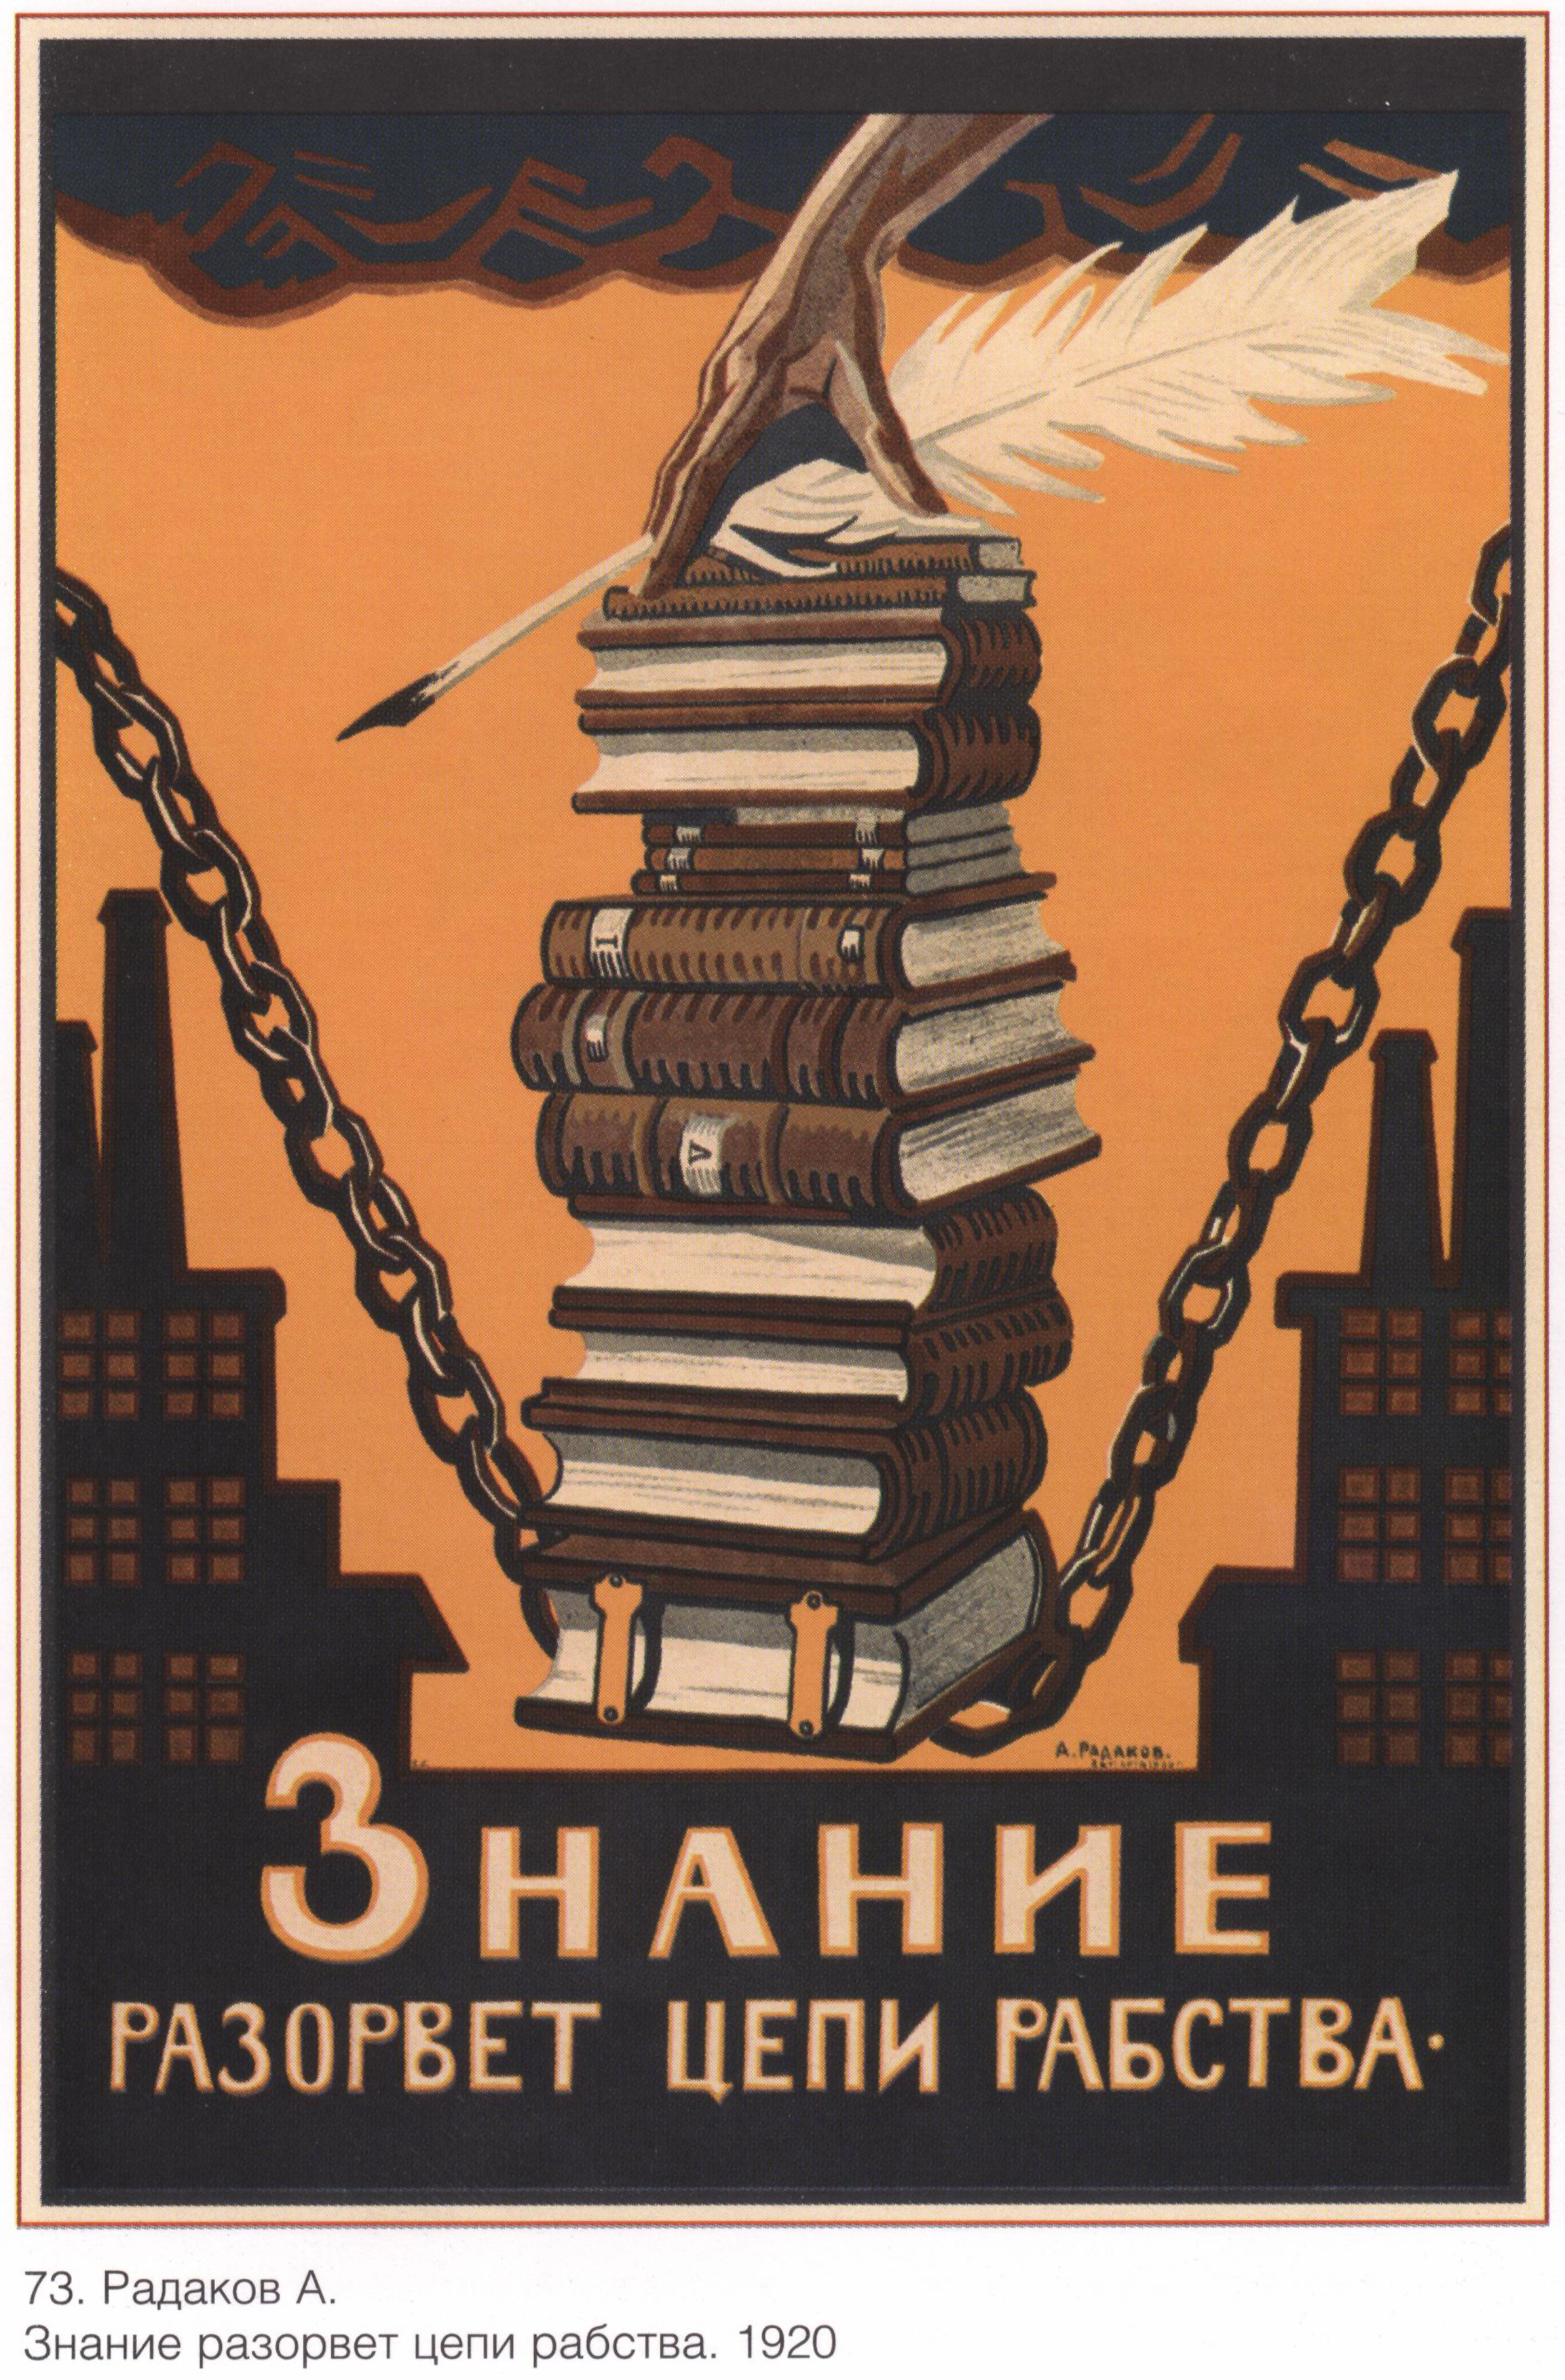 https://www.historyworlds.ru/uploads/gallery/main/261/sovpolpost_00025_1.jpg